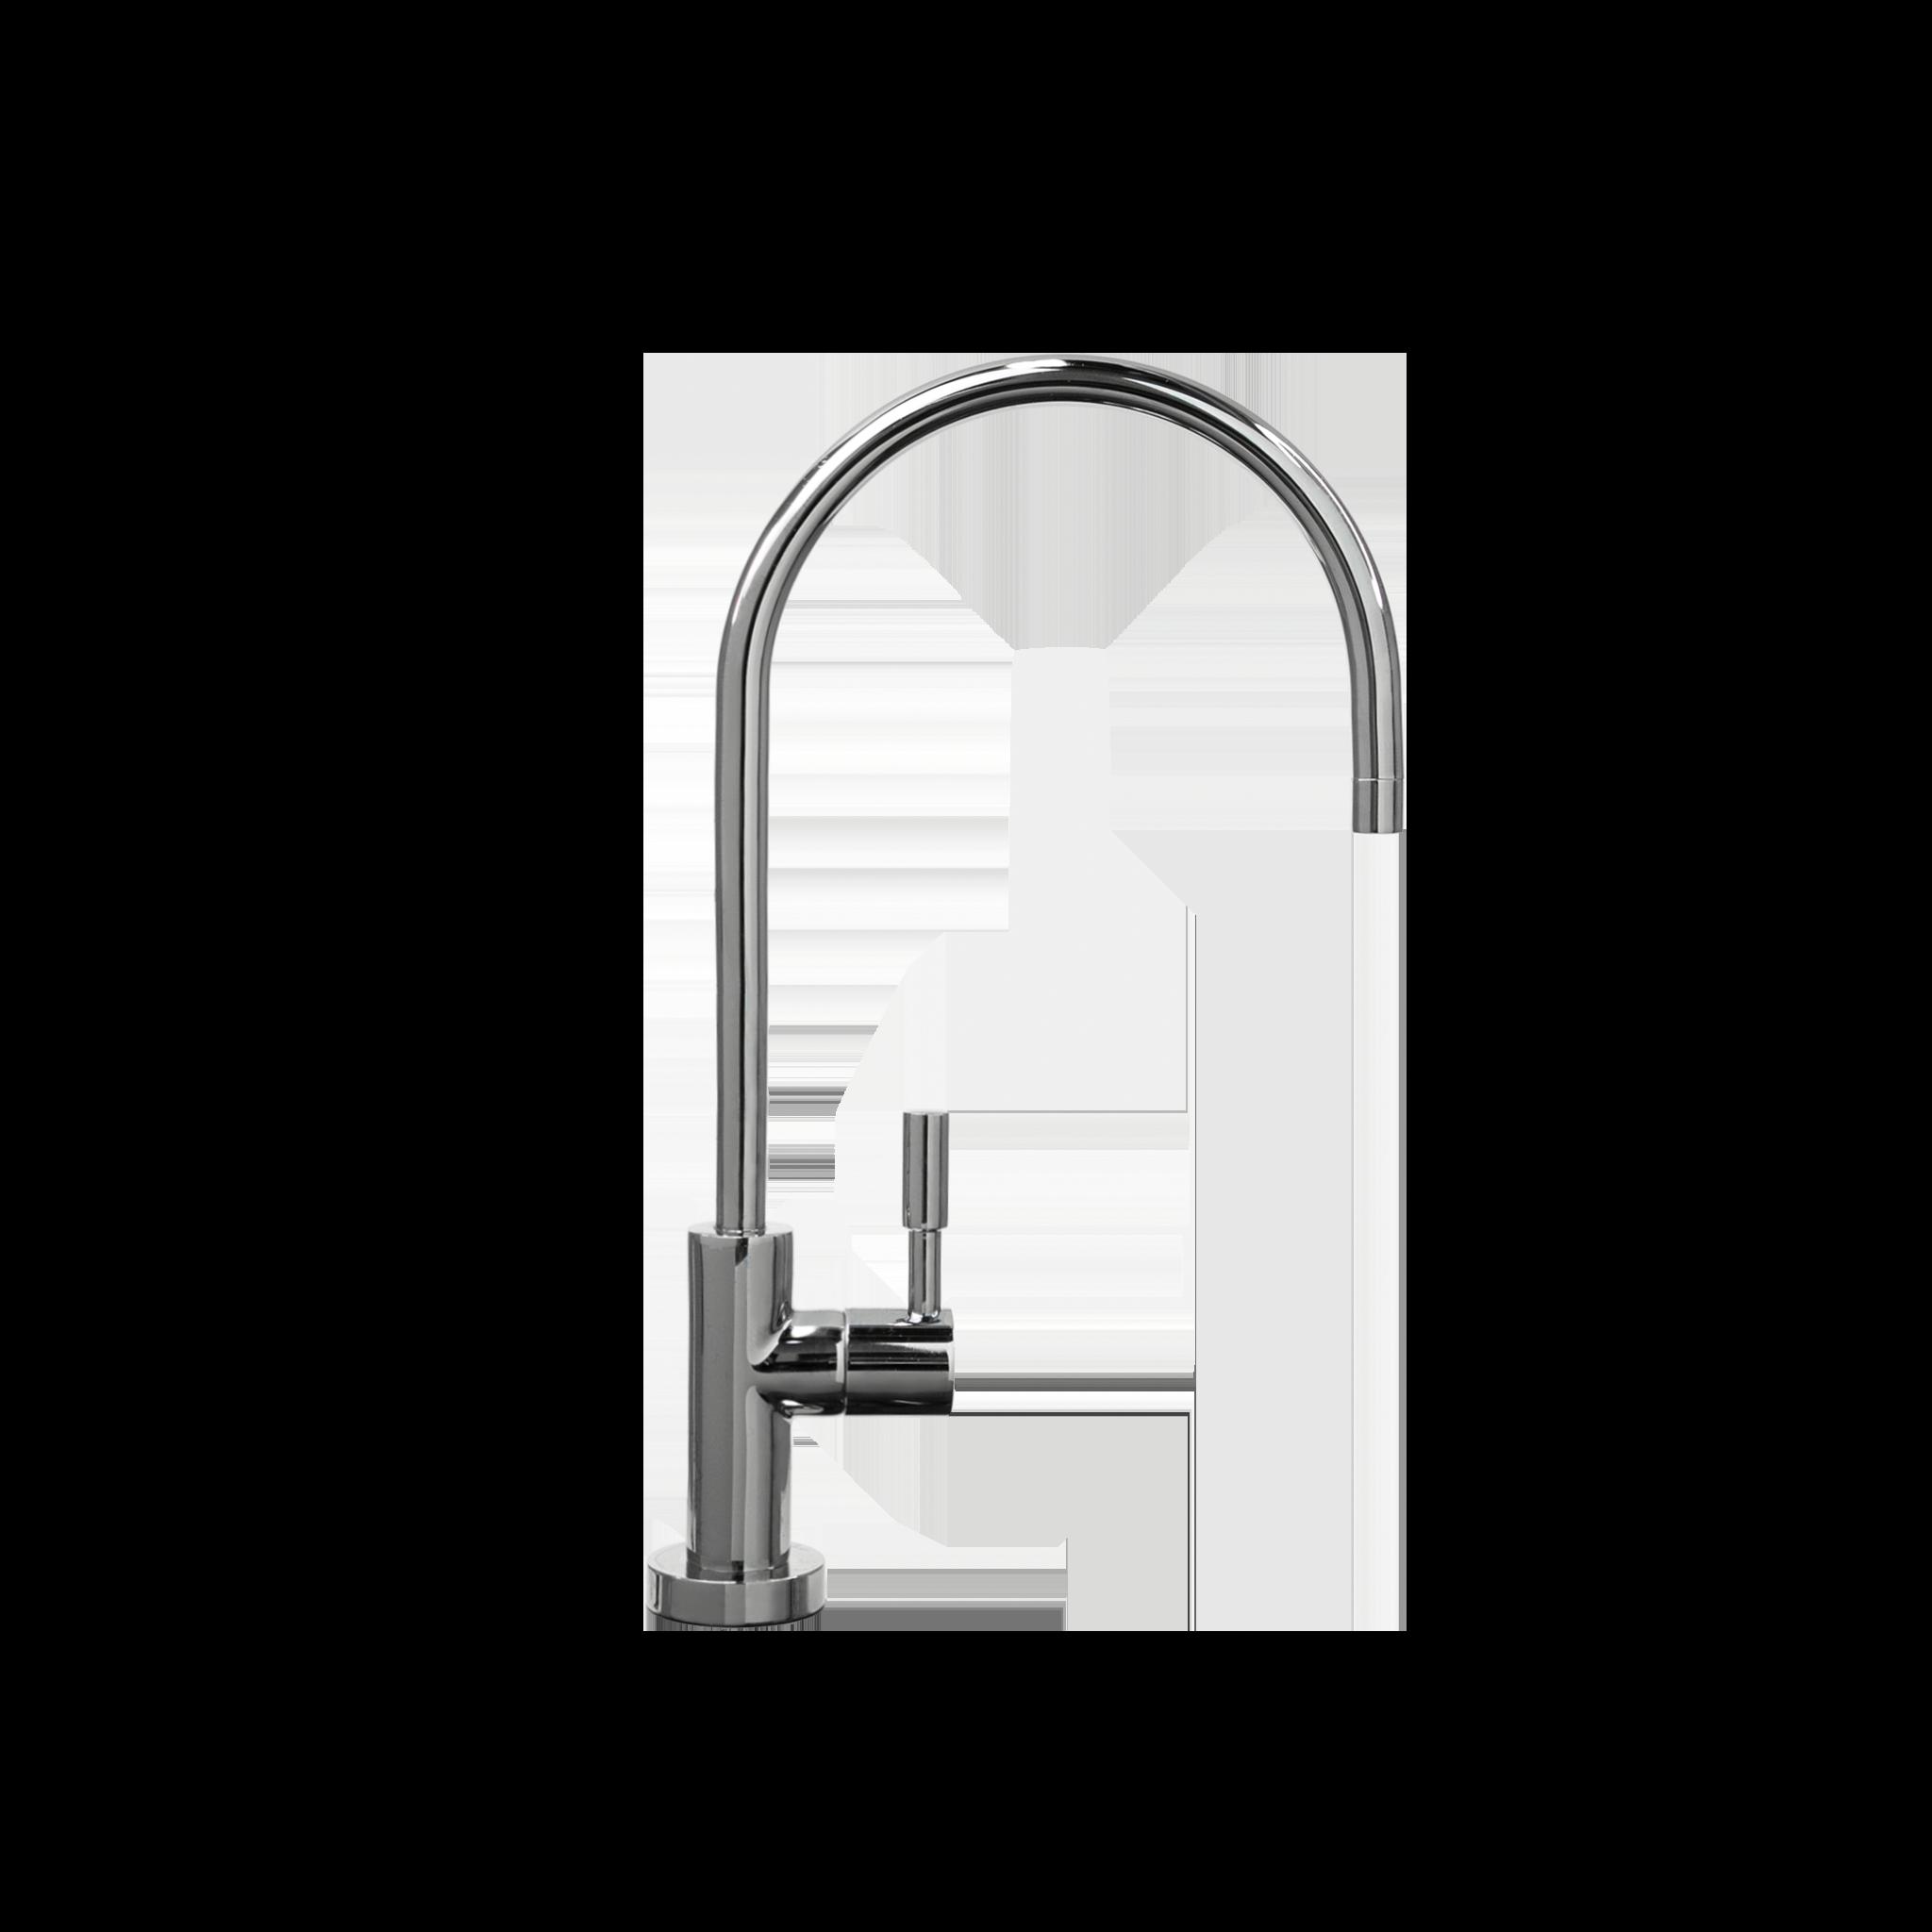 hydrogen water faucet